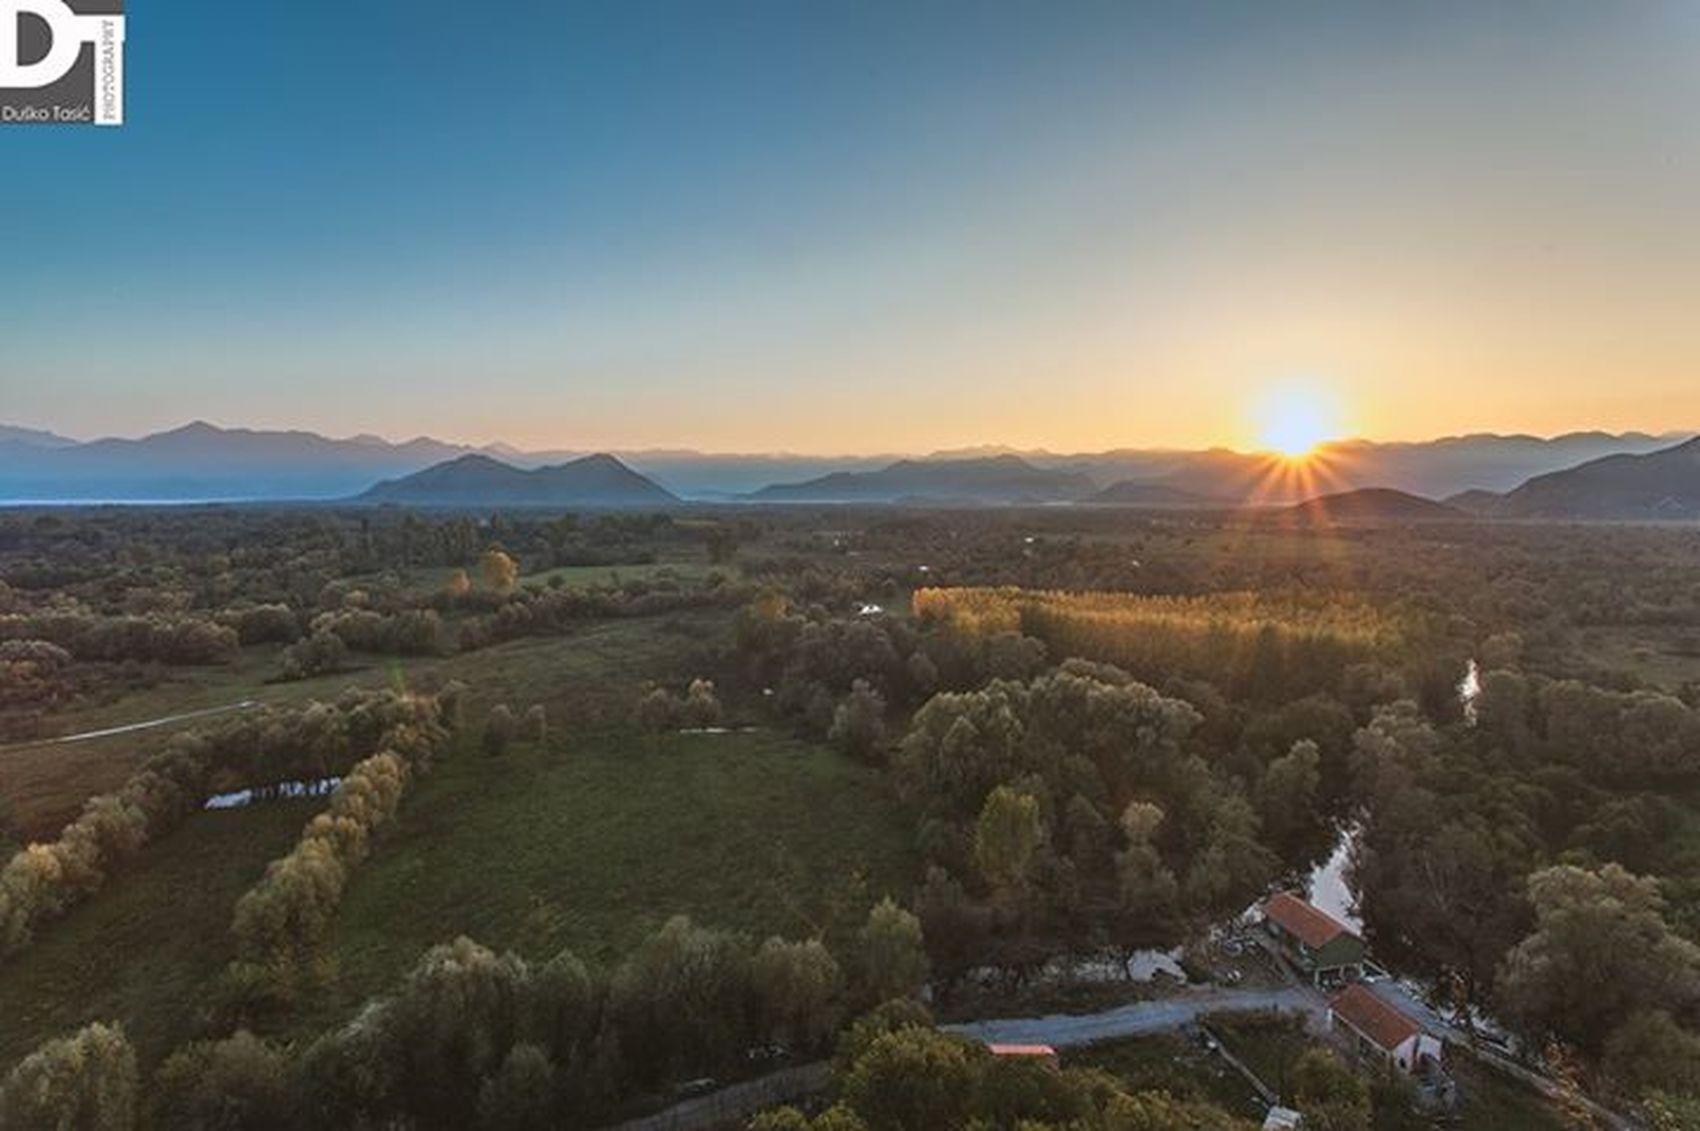 Filippa K Asks: What Inspires You? Autumn Colors Montenegro Landscape beautiful moment...